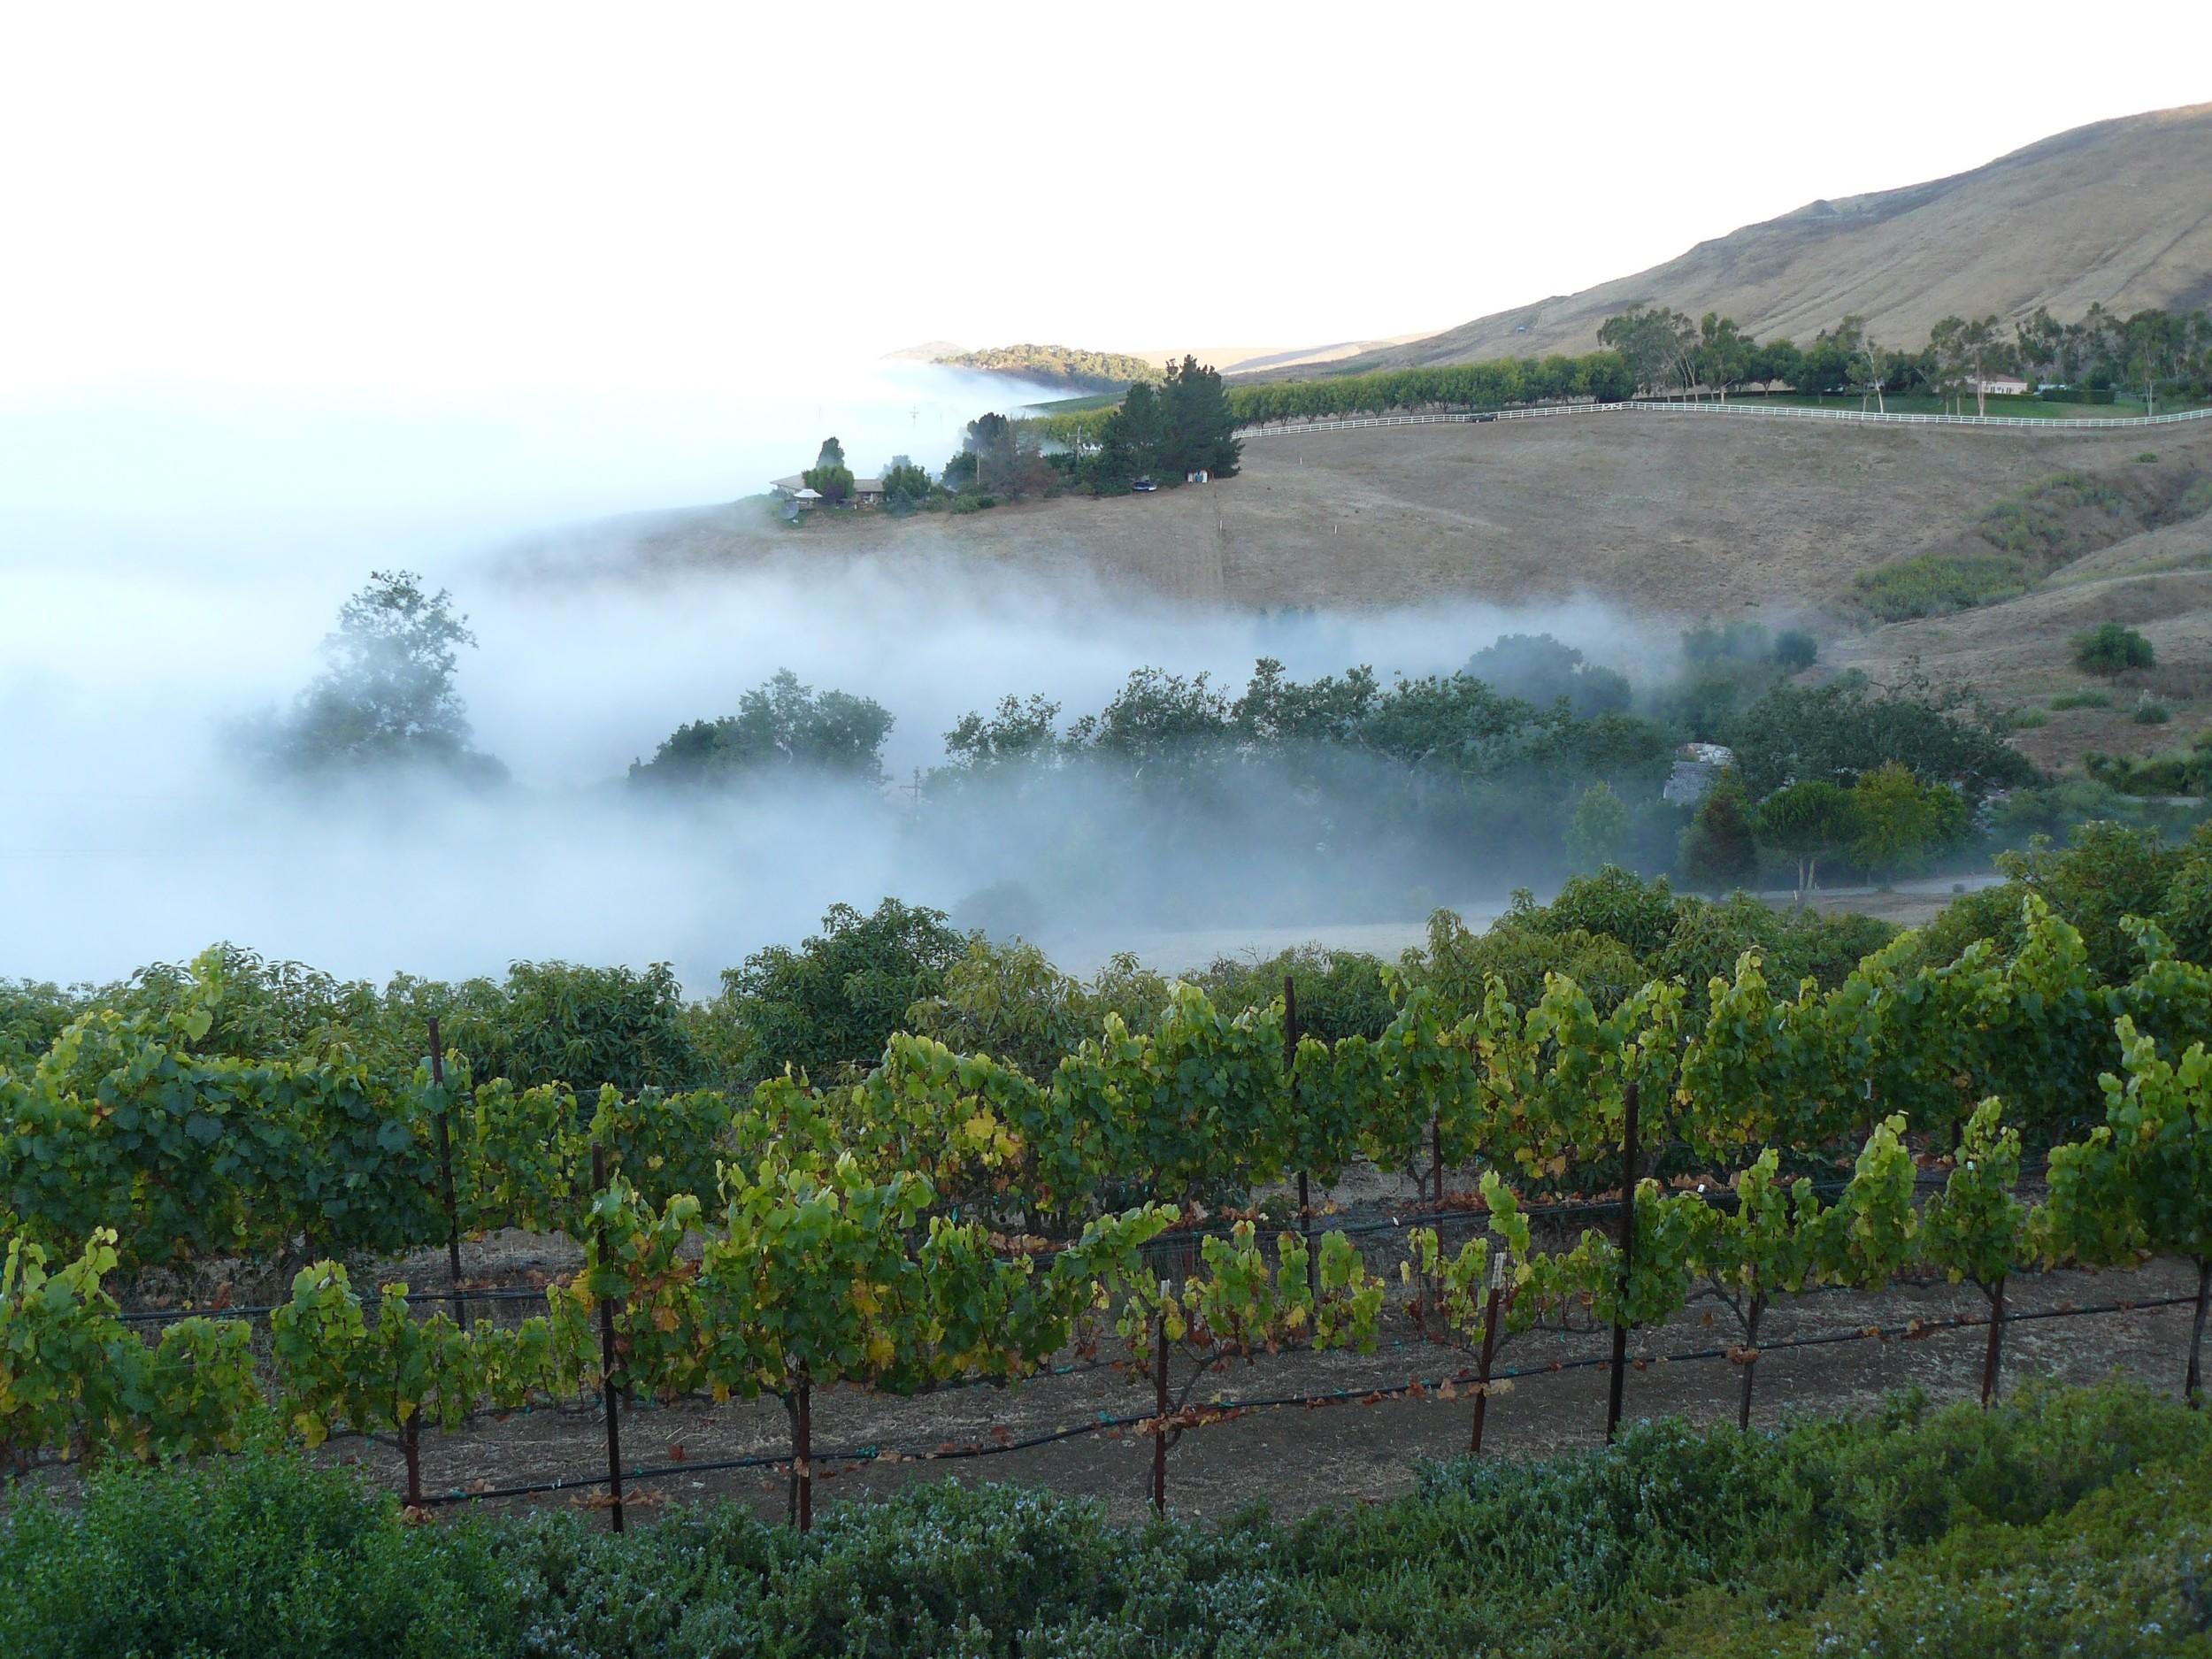 SLO Coast Fog over Vineyards via Phantom Rivers | VAULT29